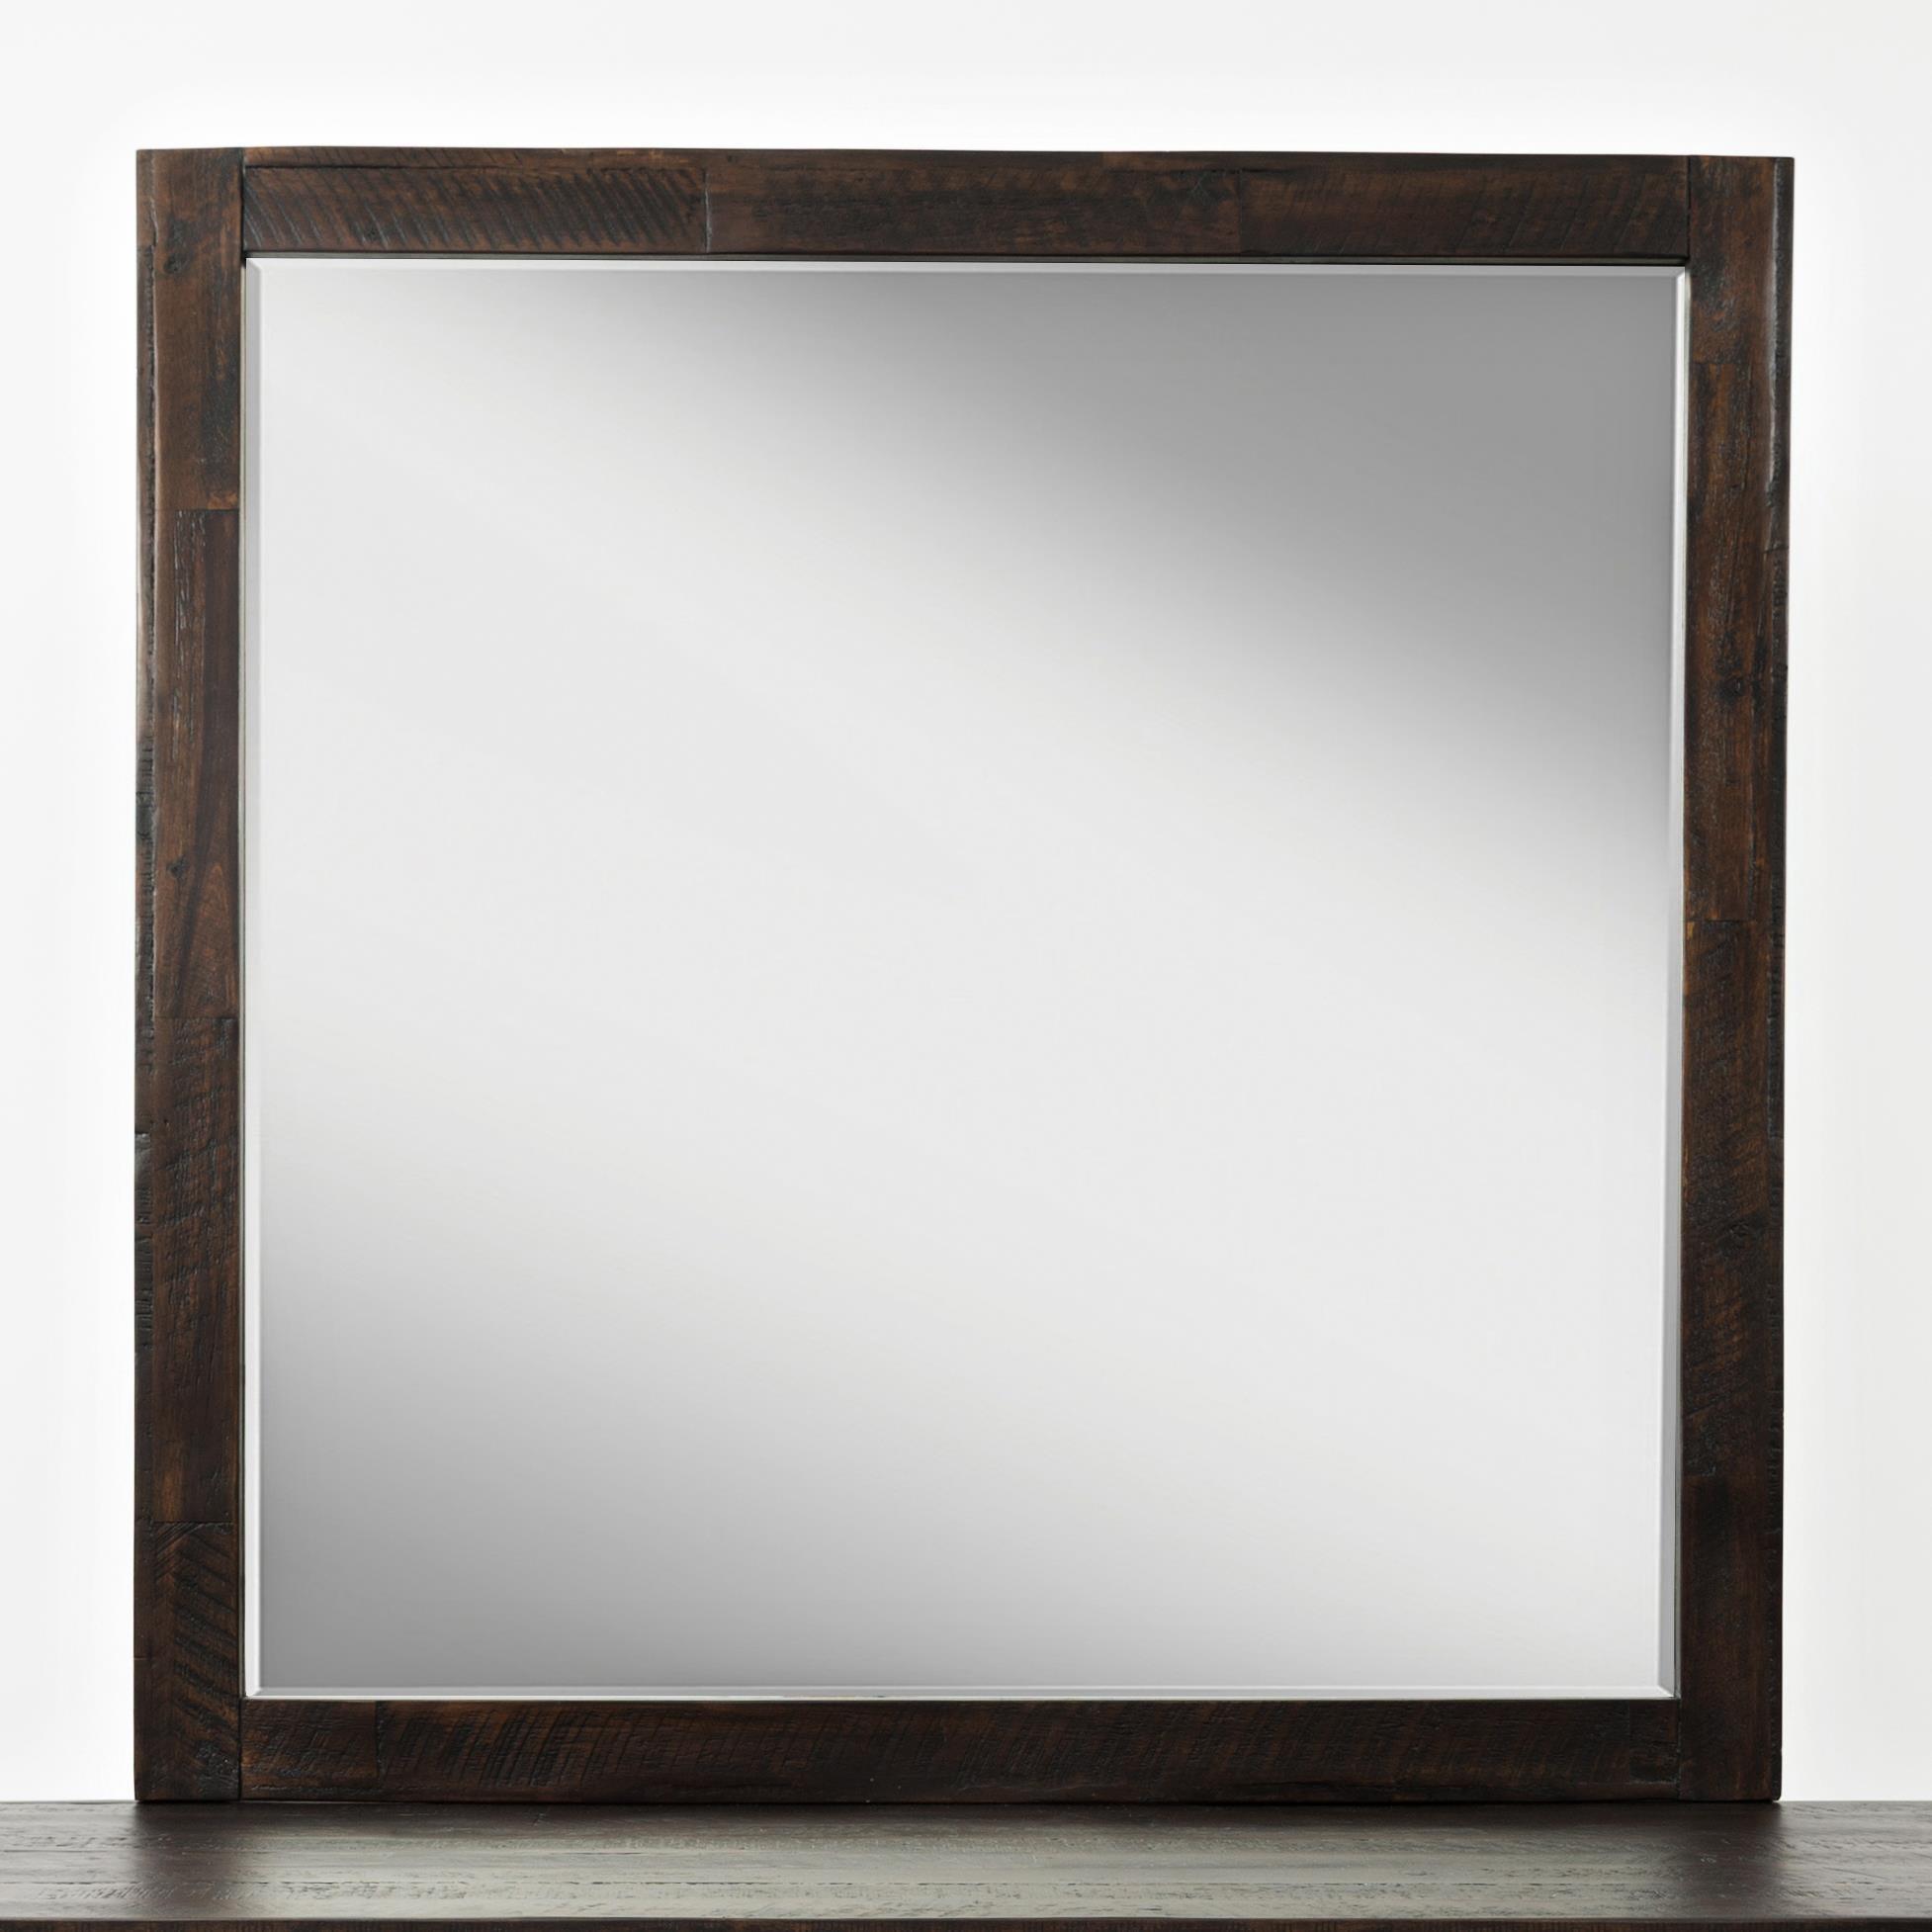 Jofran Jackson Lodge Youth Mirror - Item Number: 1605-20